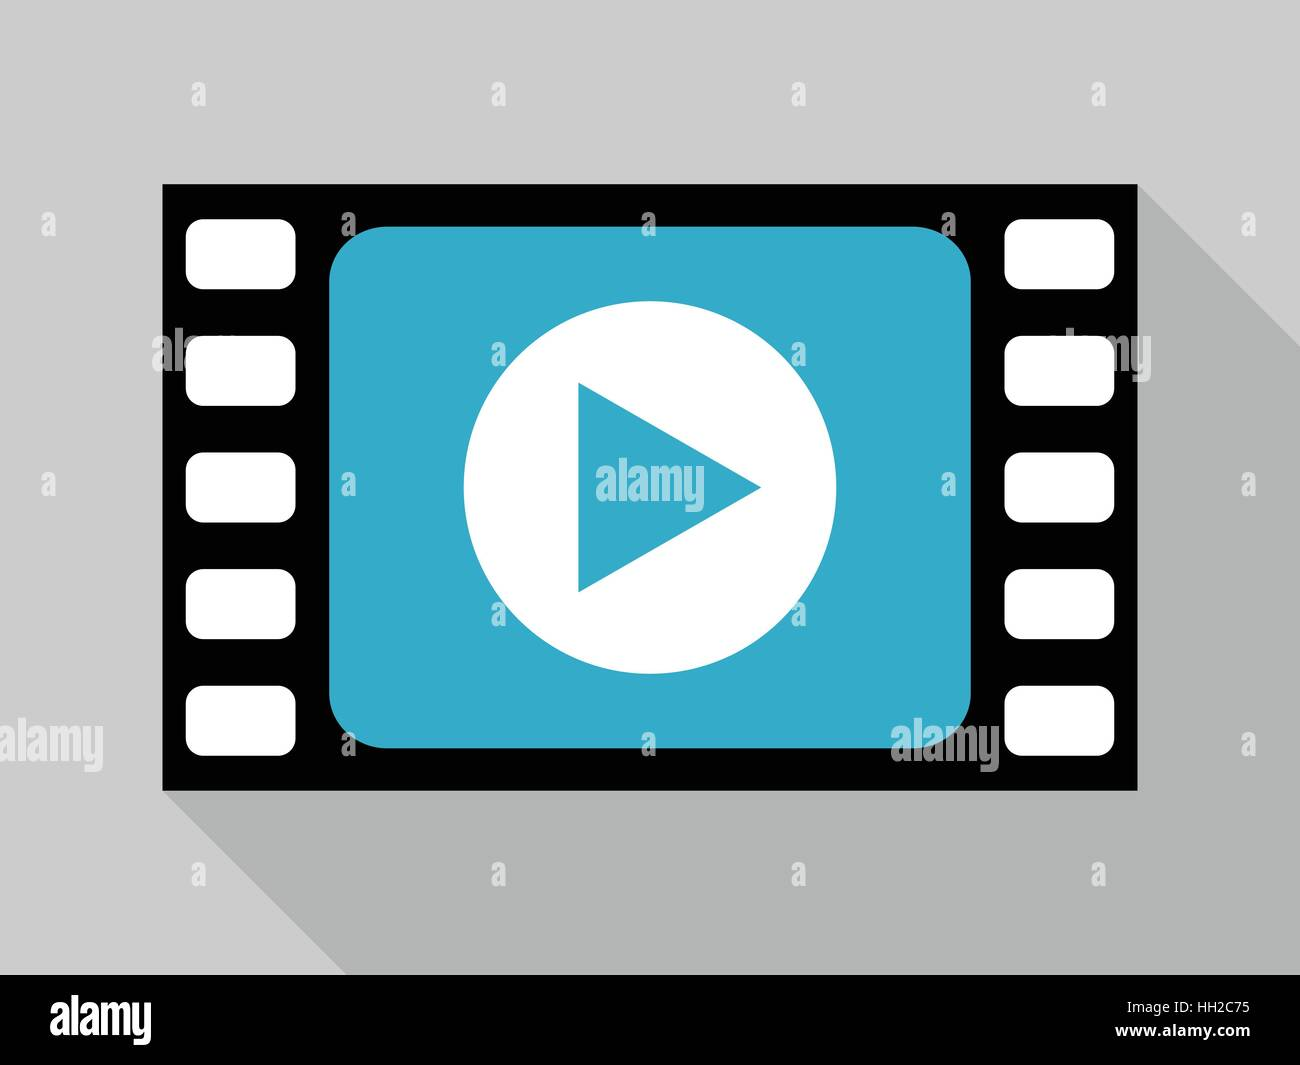 cb917525b2 Diseño plano reproducir vídeo de dibujos animados icono de vector ...